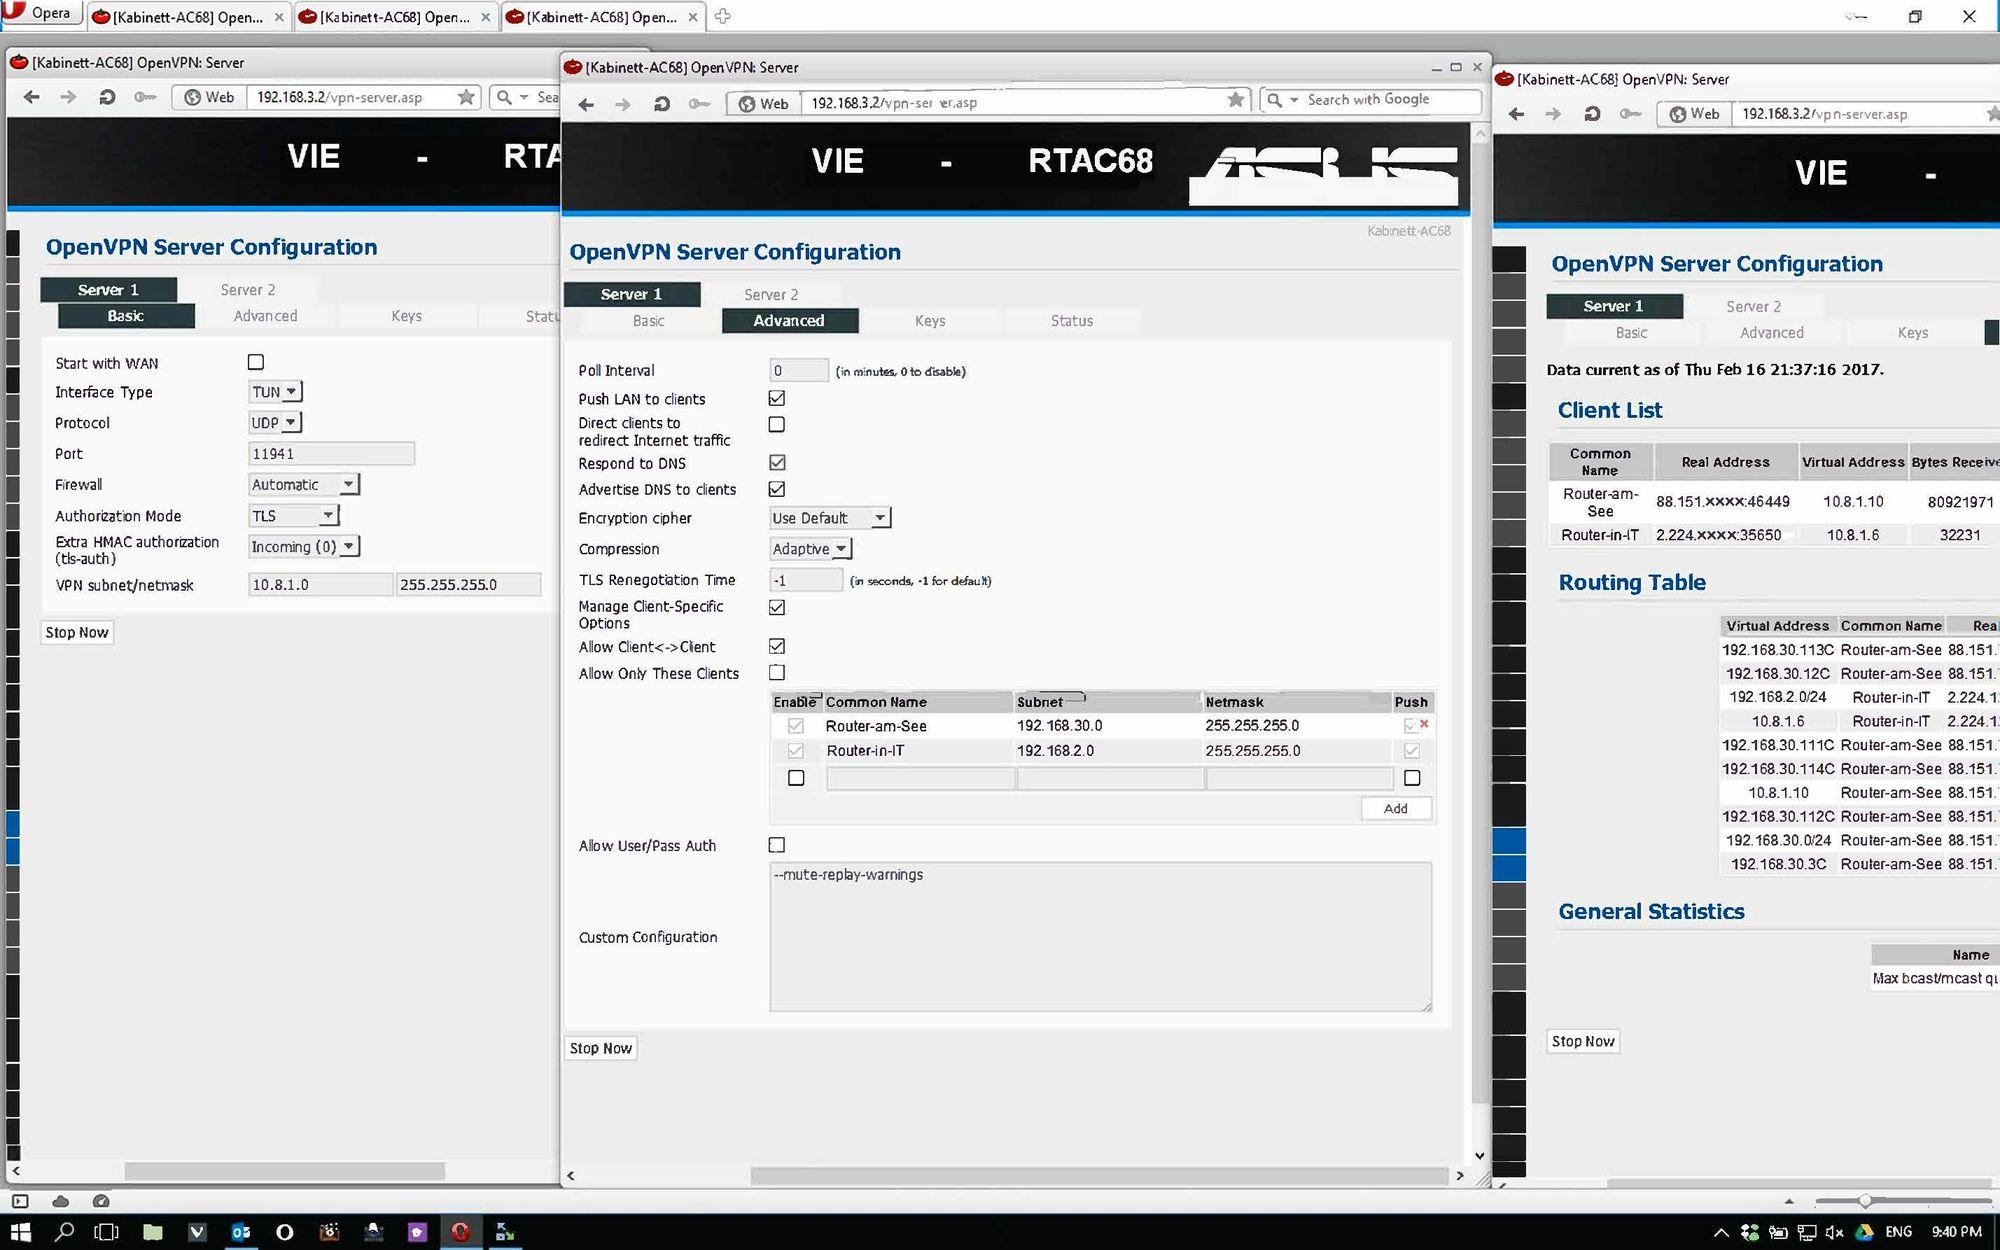 USG3 Site to site OpenVPN howto | Ubiquiti Community